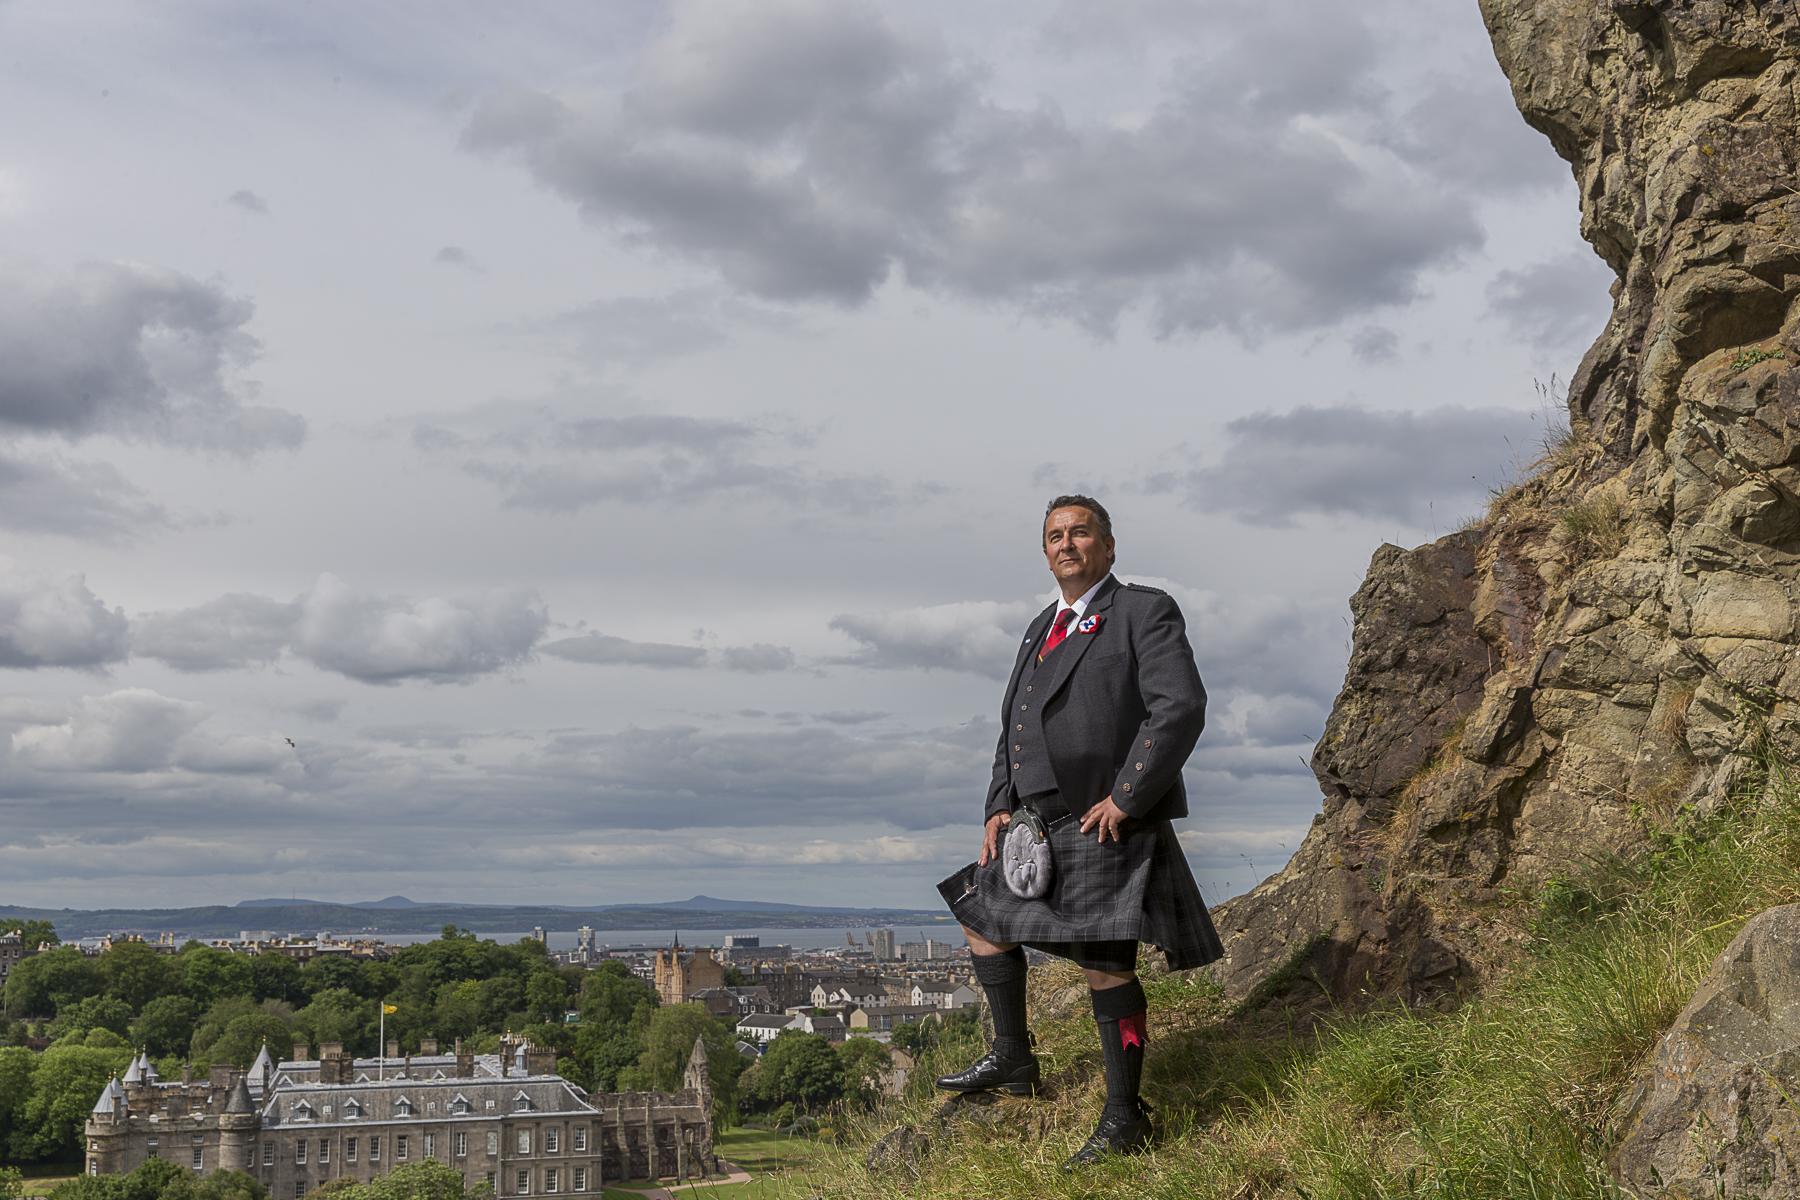 Ecosse, 2013. Christian Allard membre du Parlement Ecossais à Edimbourg.Scotland, 2013. MP Christian Allard in Edimbourg.